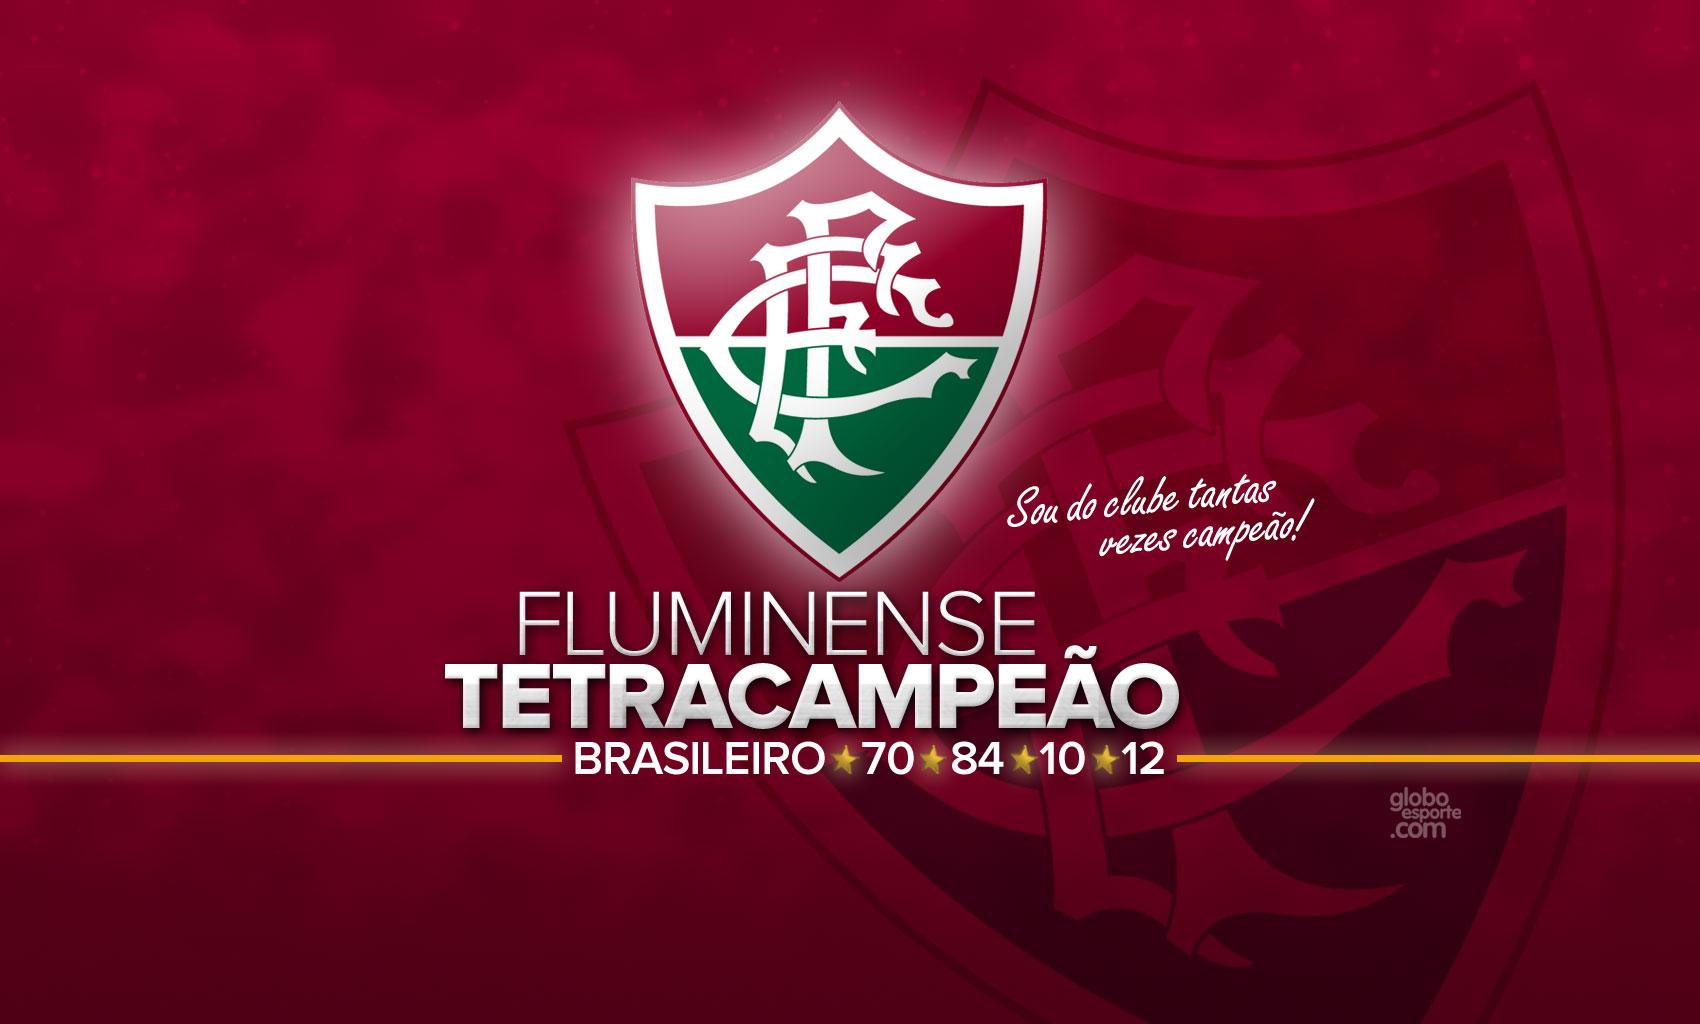 Wallpaper: Fluminense Campeão Brasileiro 2012 (6)